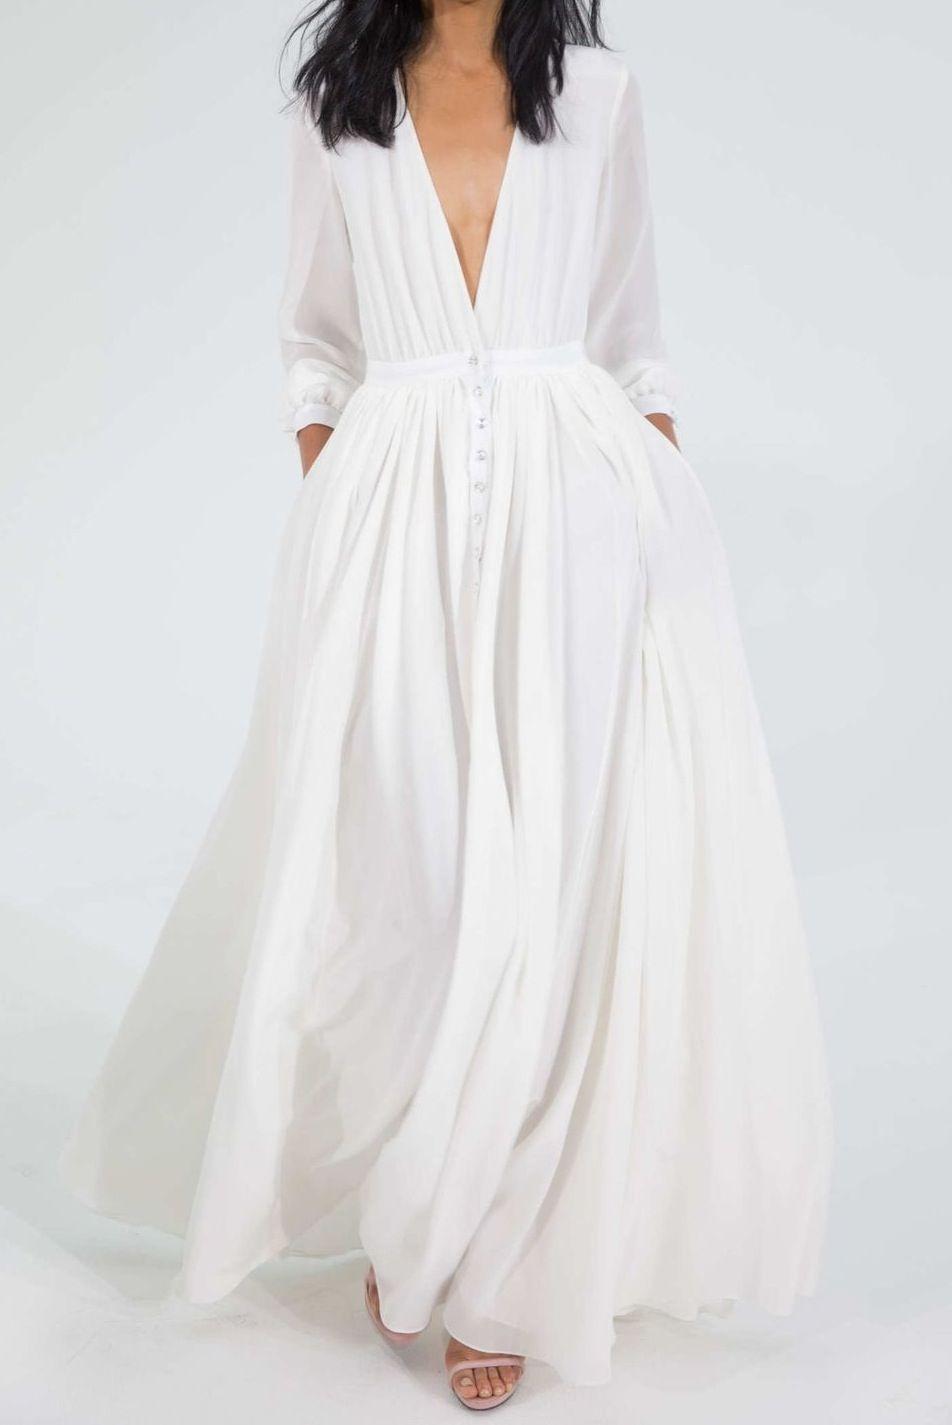 PINNED | WHITE FASHION & FABRICS | Pinterest | Dresses, Fashion and ...